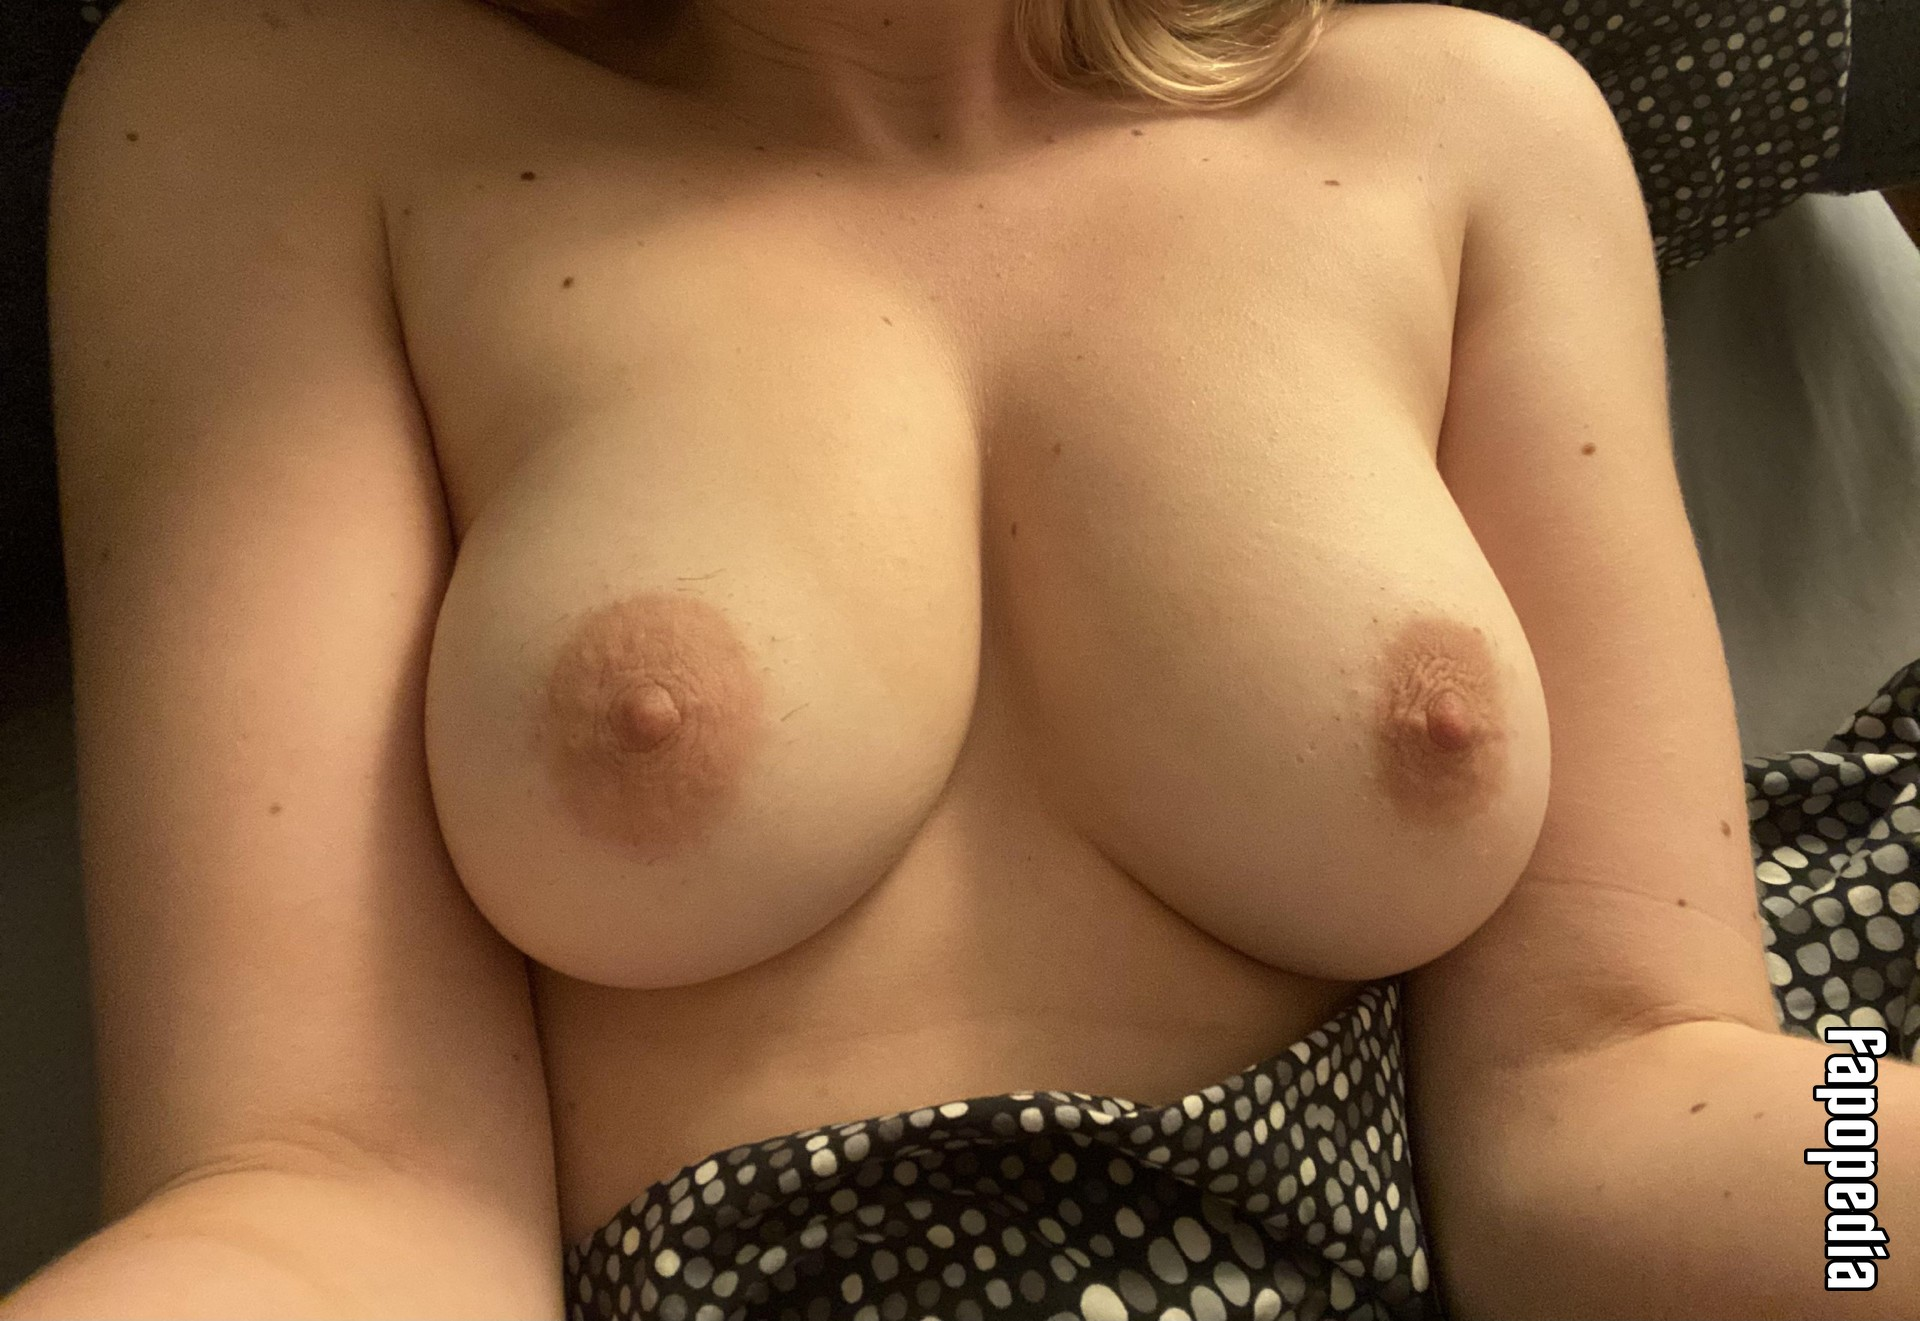 Liz_edwards99 Nude Leaks